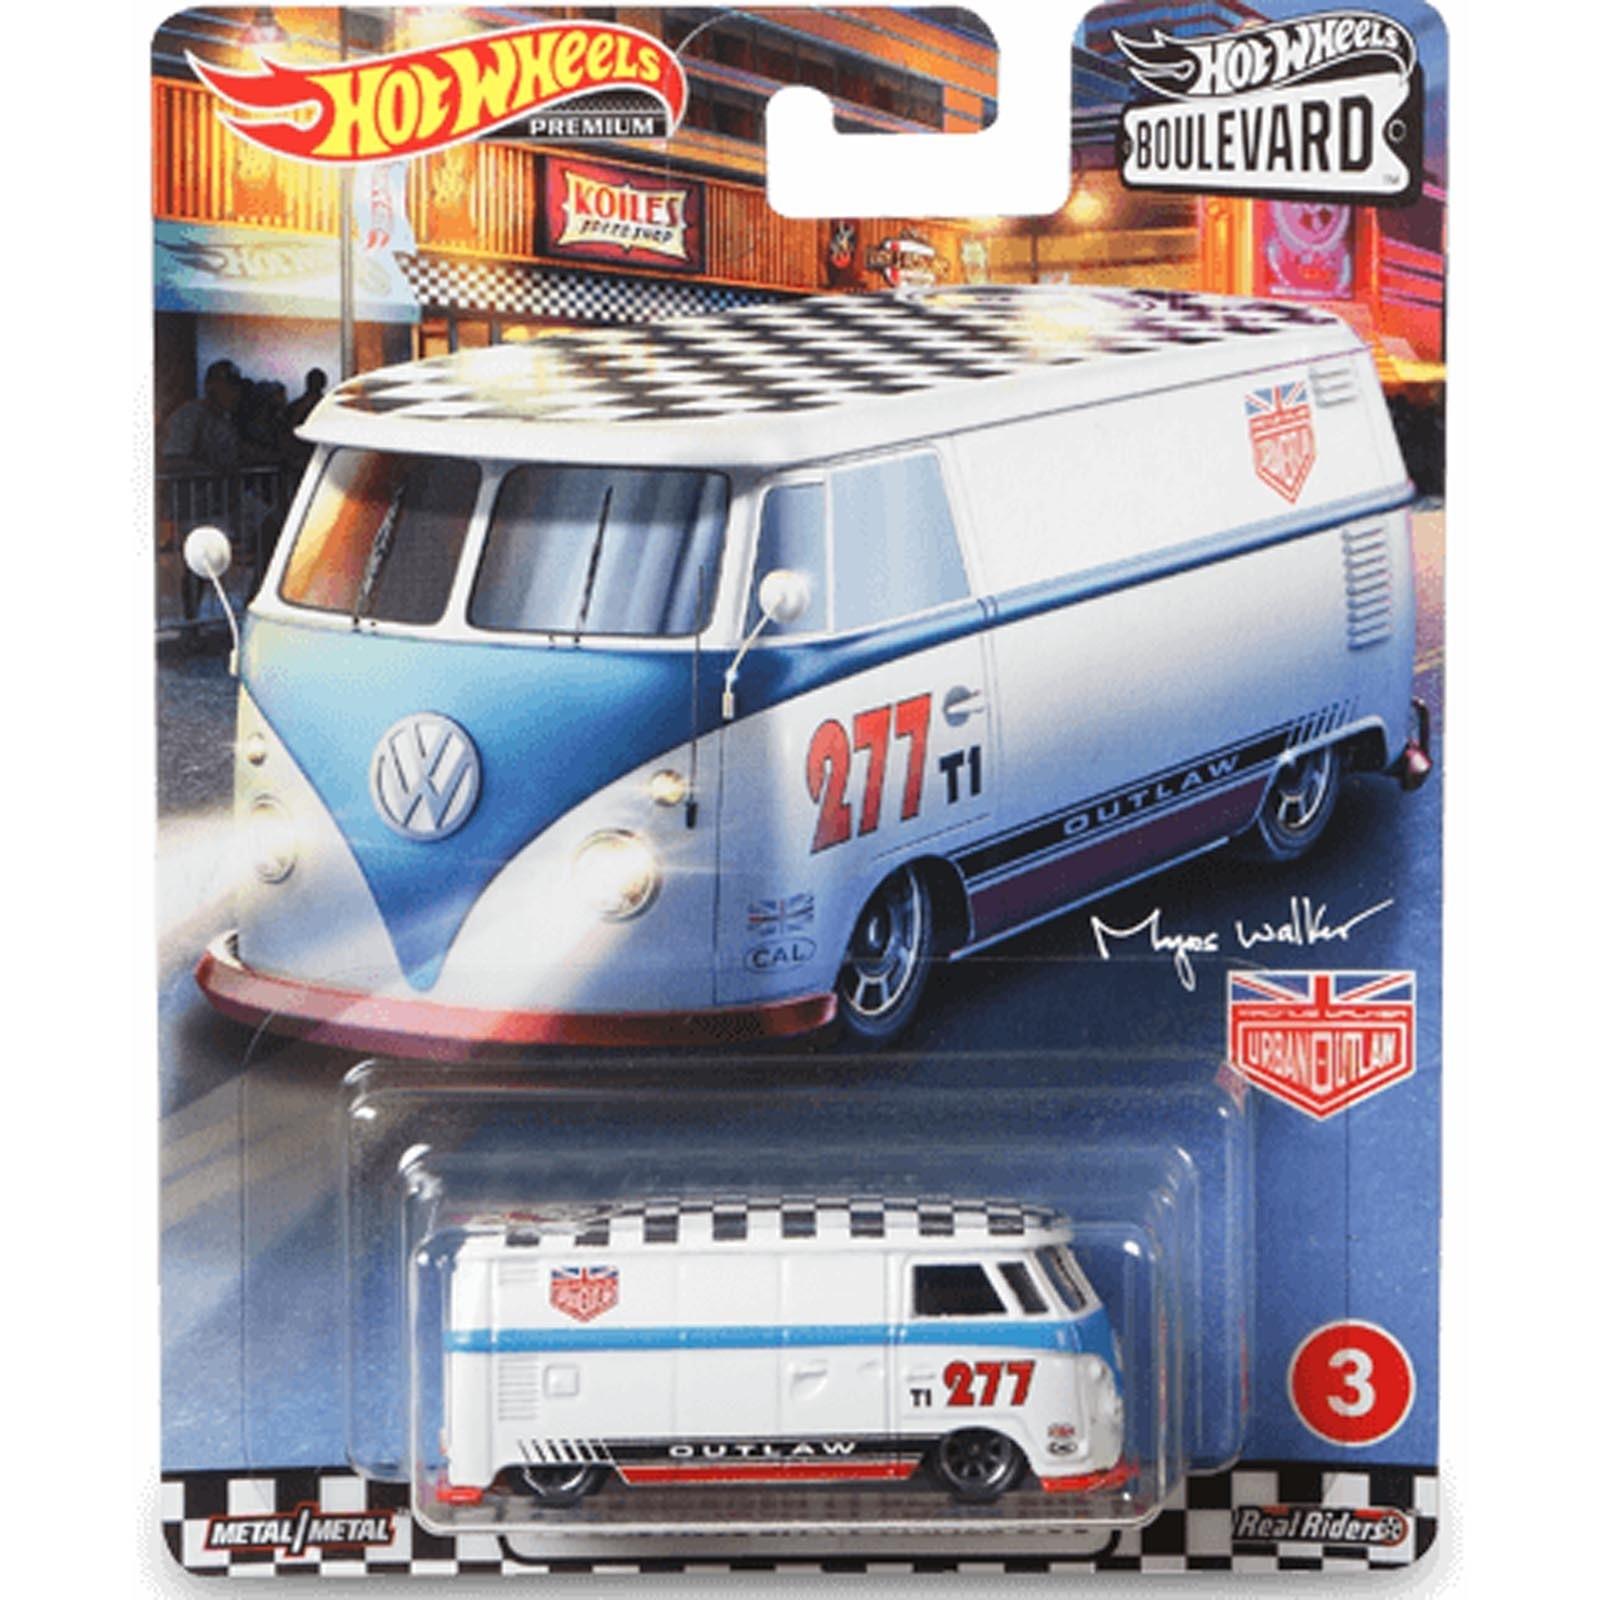 Hot Wheels Volkswagen T1 Panel Bus Kombi Boulevard Gjt70 Escala Miniaturas By Mão Na Roda 4x4